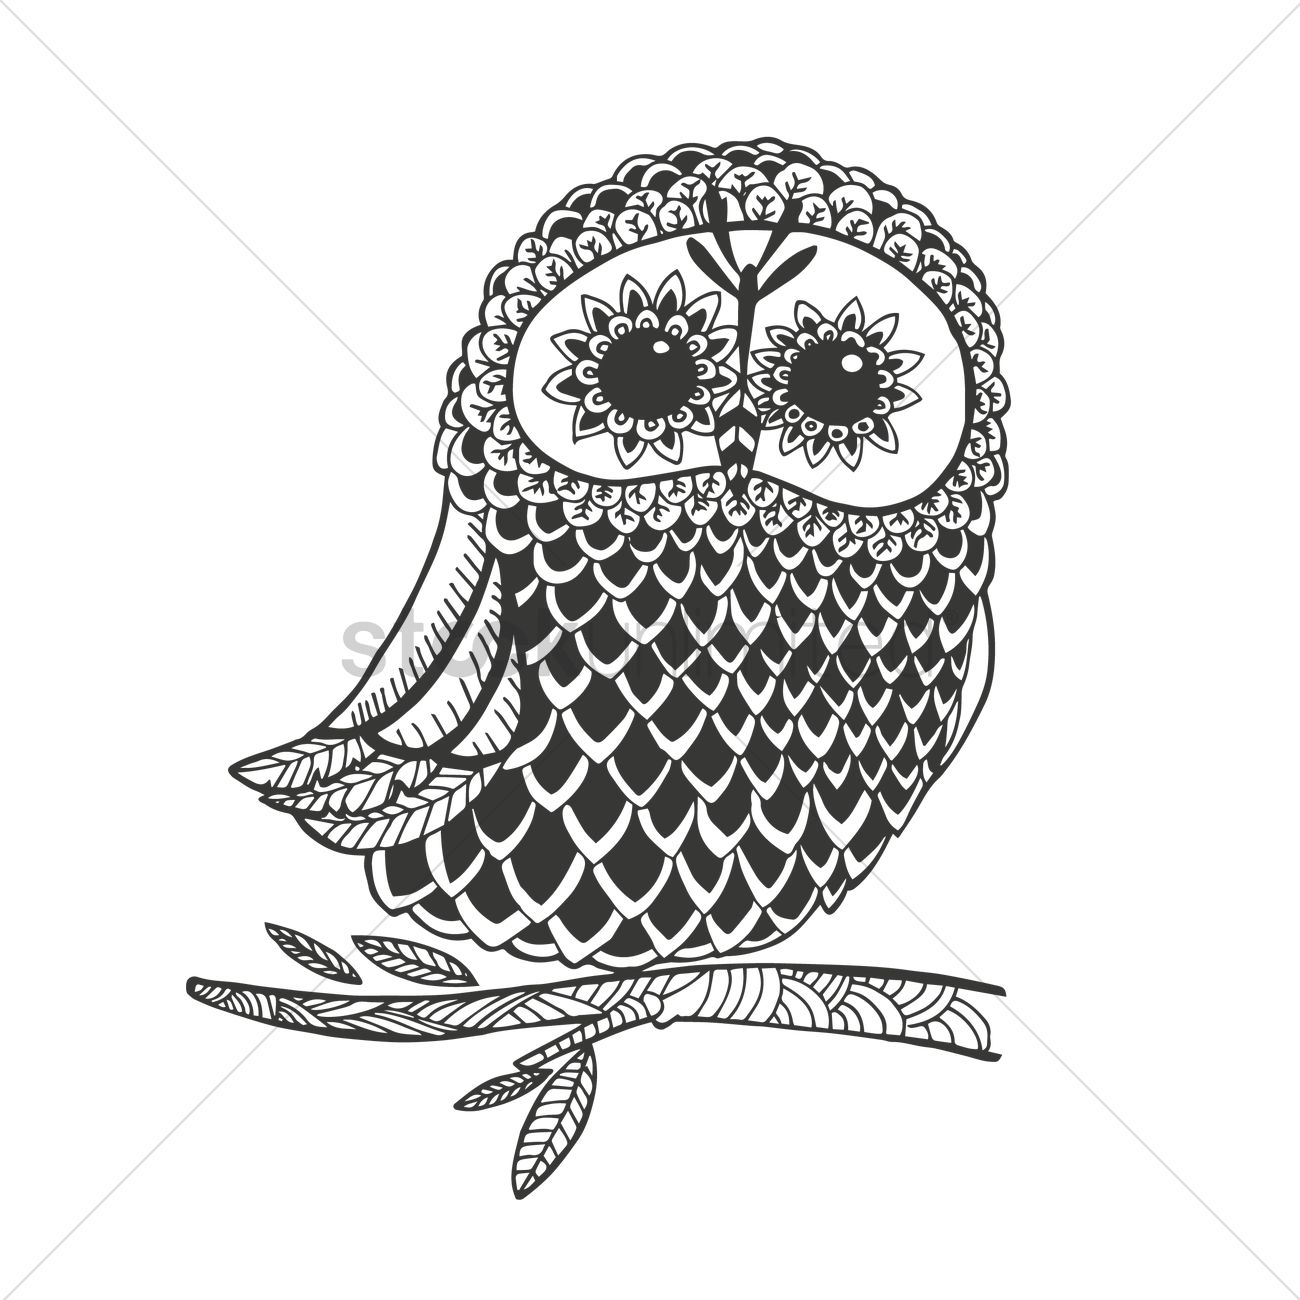 Intricate Owl Design Vector Image